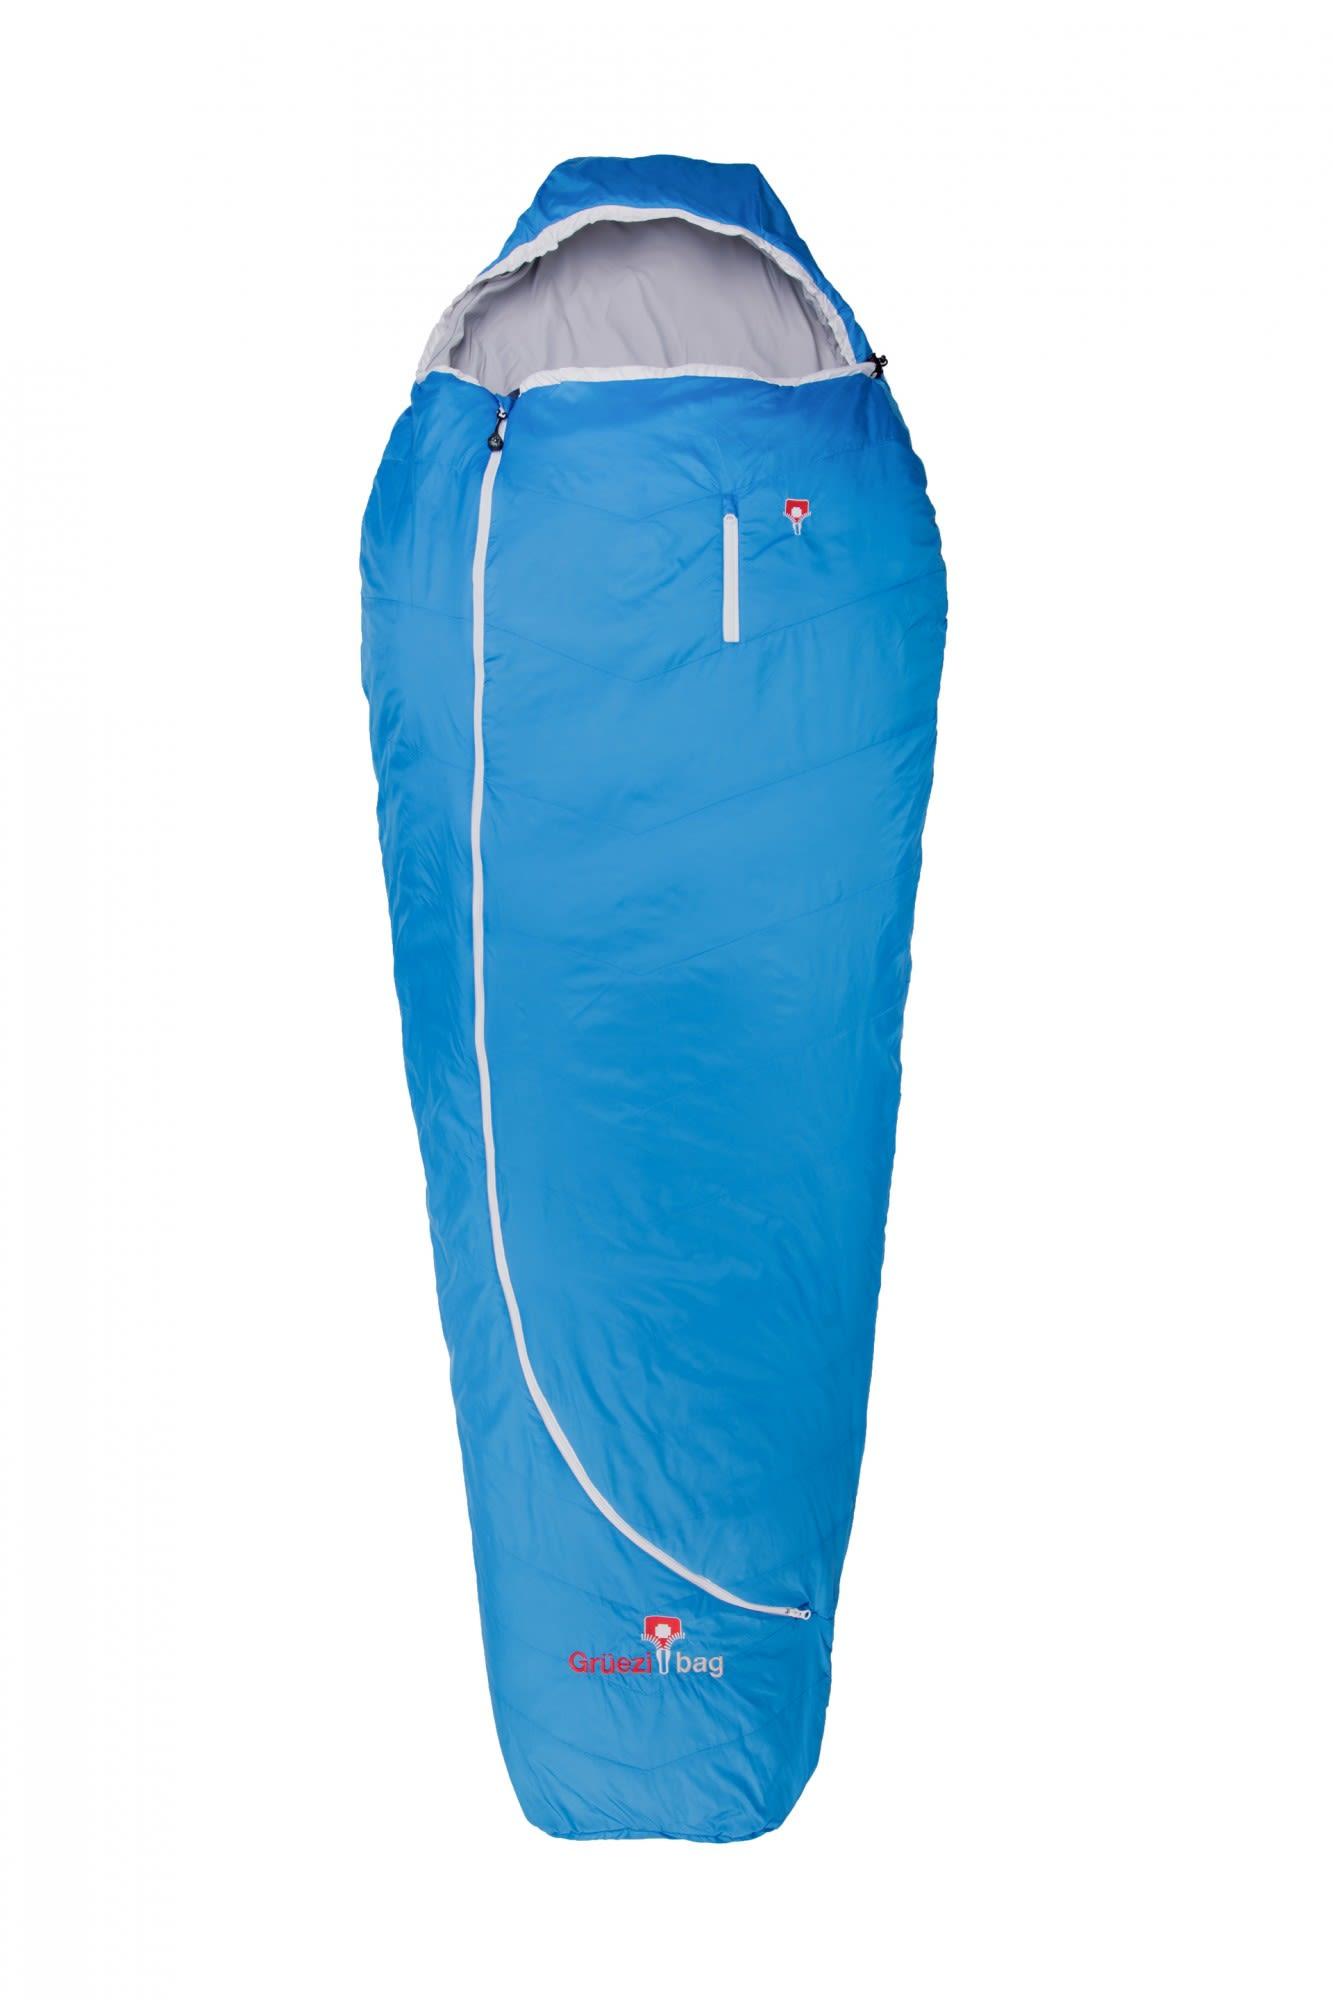 Grüezi Bag Biopod Wolle Plus Blau, Daunen Wollschlafsack, 215 cm -RV rechts